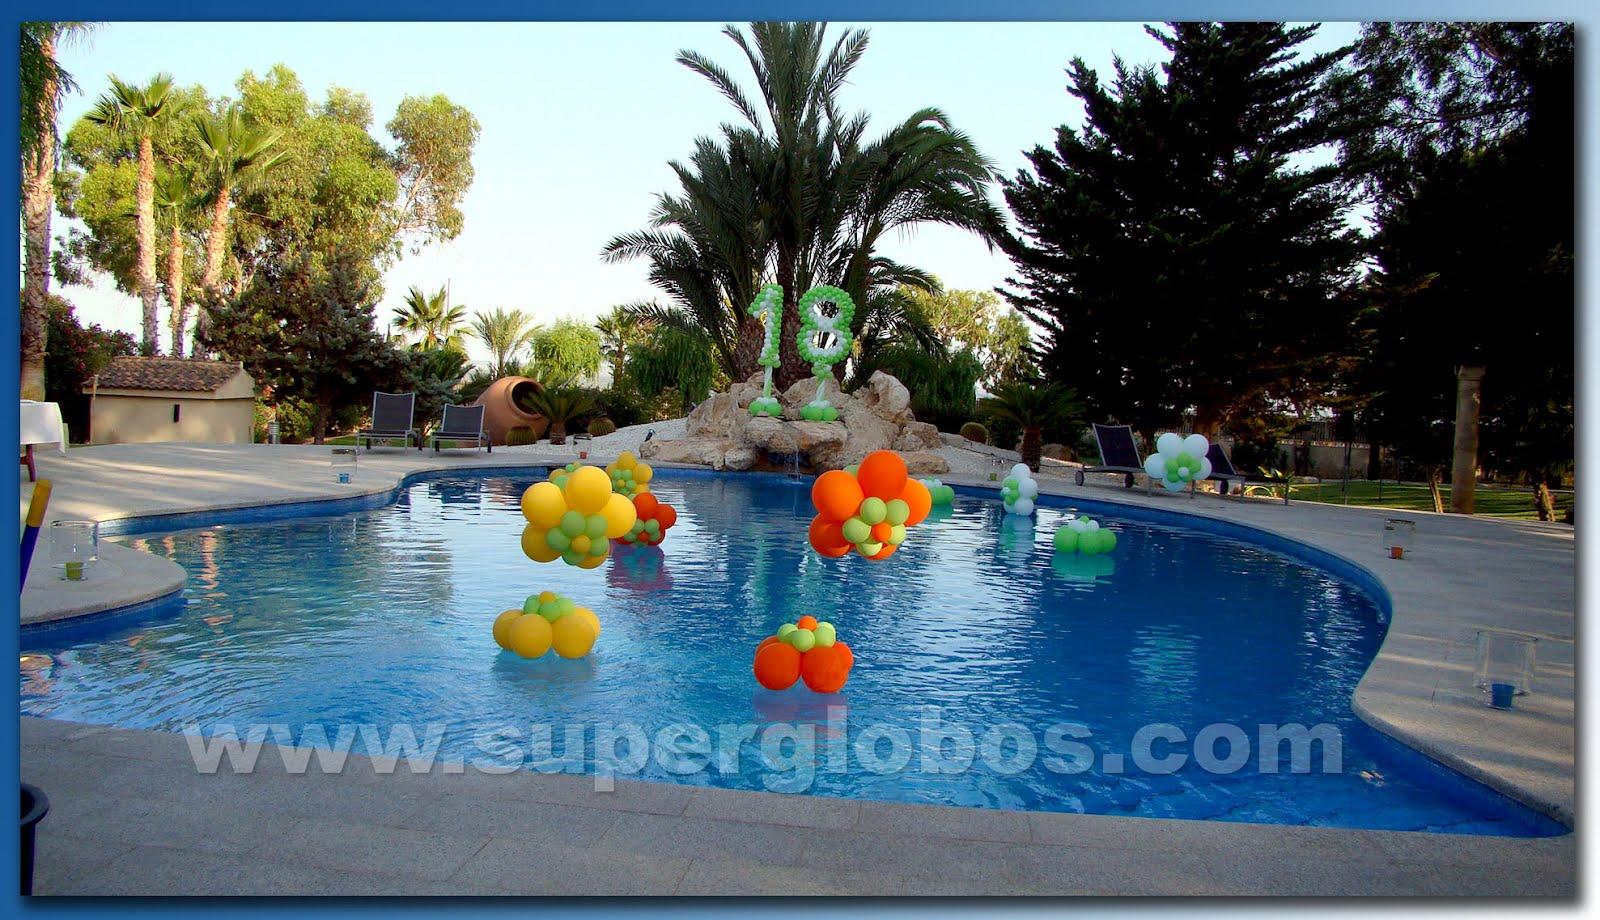 Decoracion Bautizo En Jardin ~ Pin Arreglos Para Graduacion Claudis B Fotolog Pelautscom on Pinterest